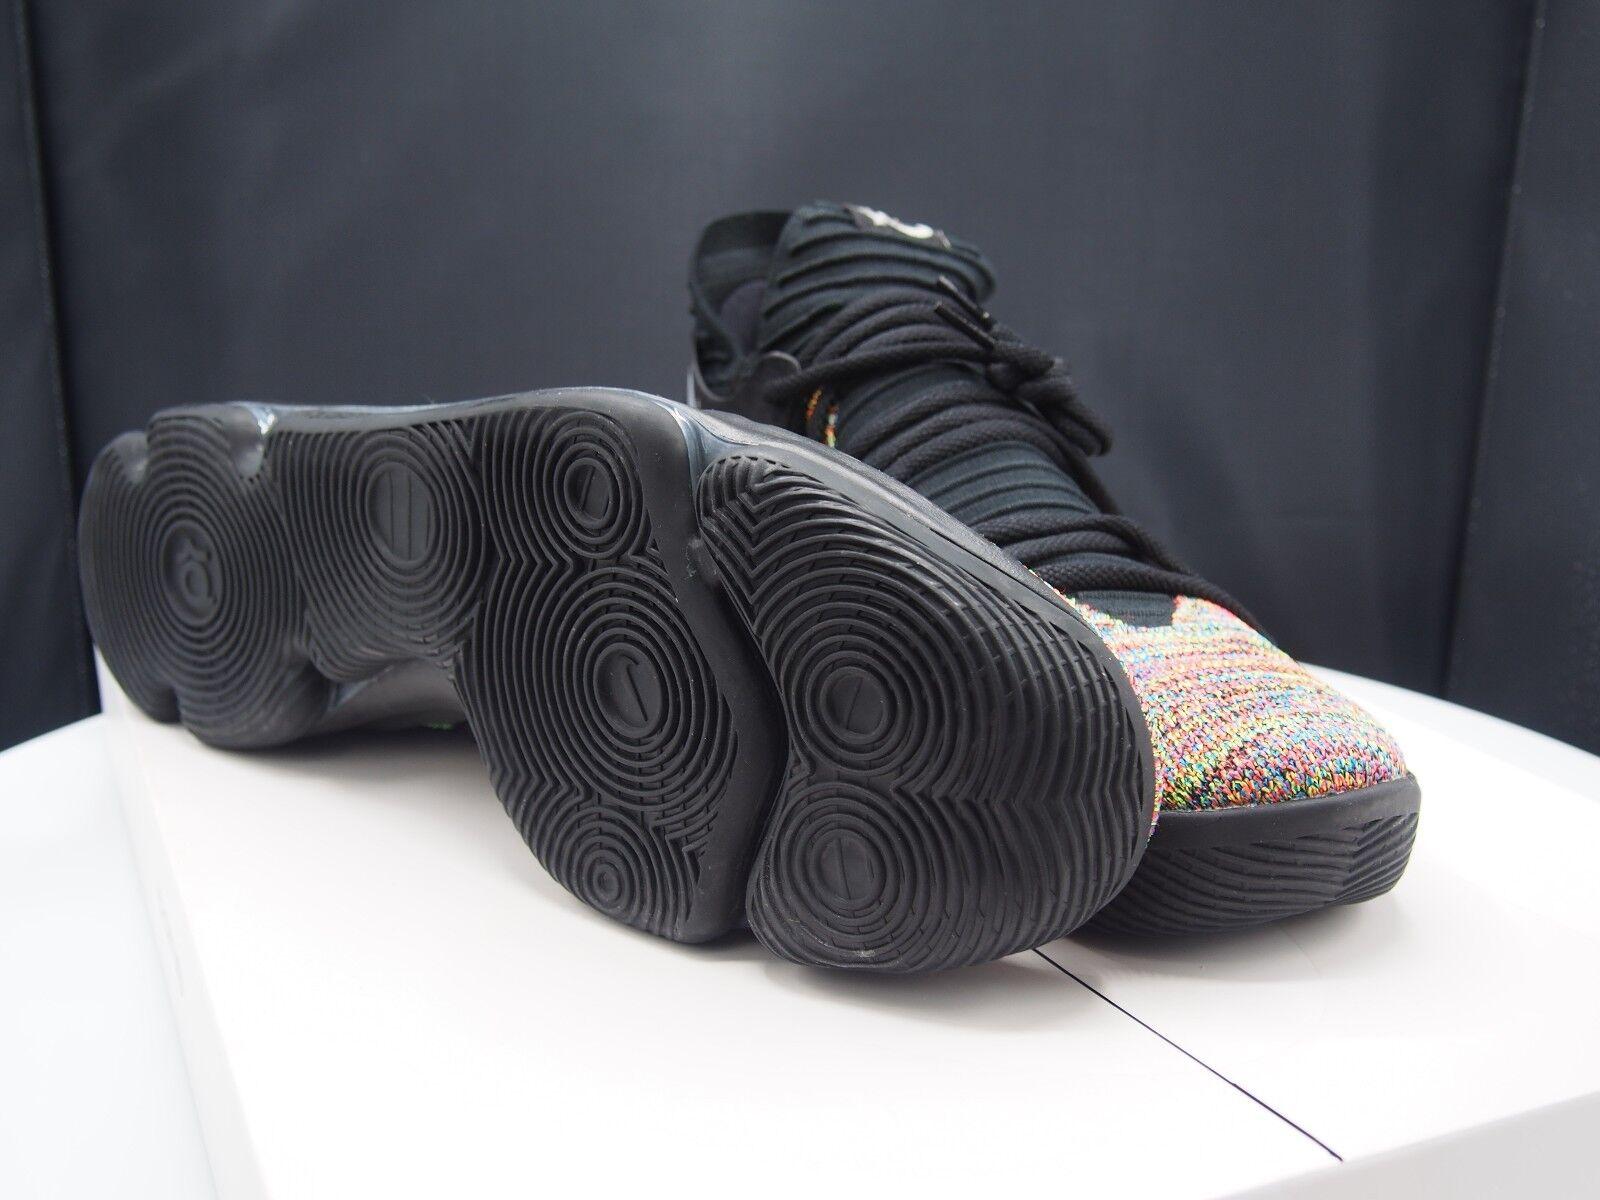 reputable site 8afa9 47b09 ... Nike zoom kdx kdx kdx 10 ...